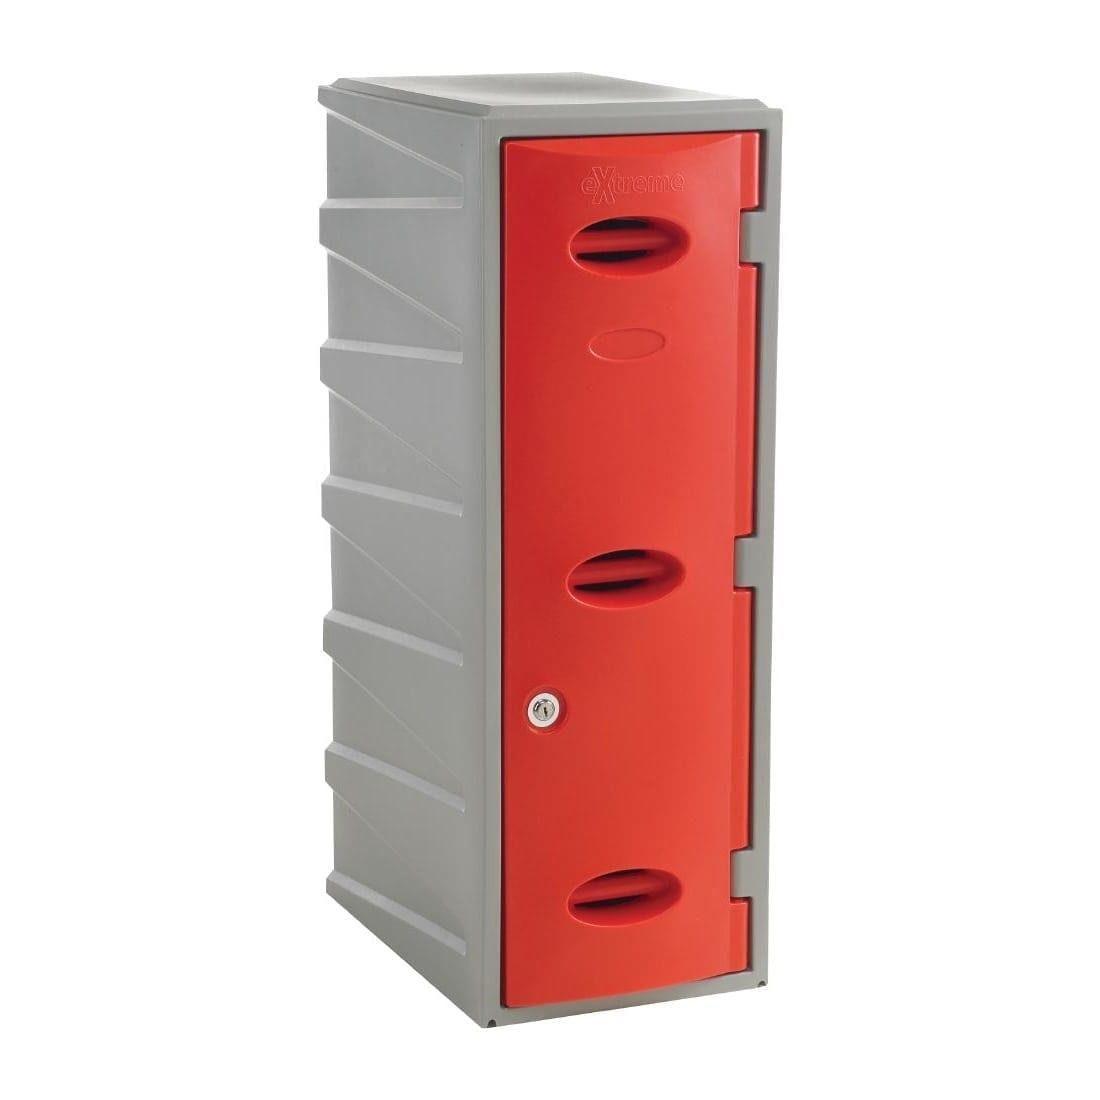 Extreme Modular Plastic Locker - 900mm high Red Camlock (Direct)-0